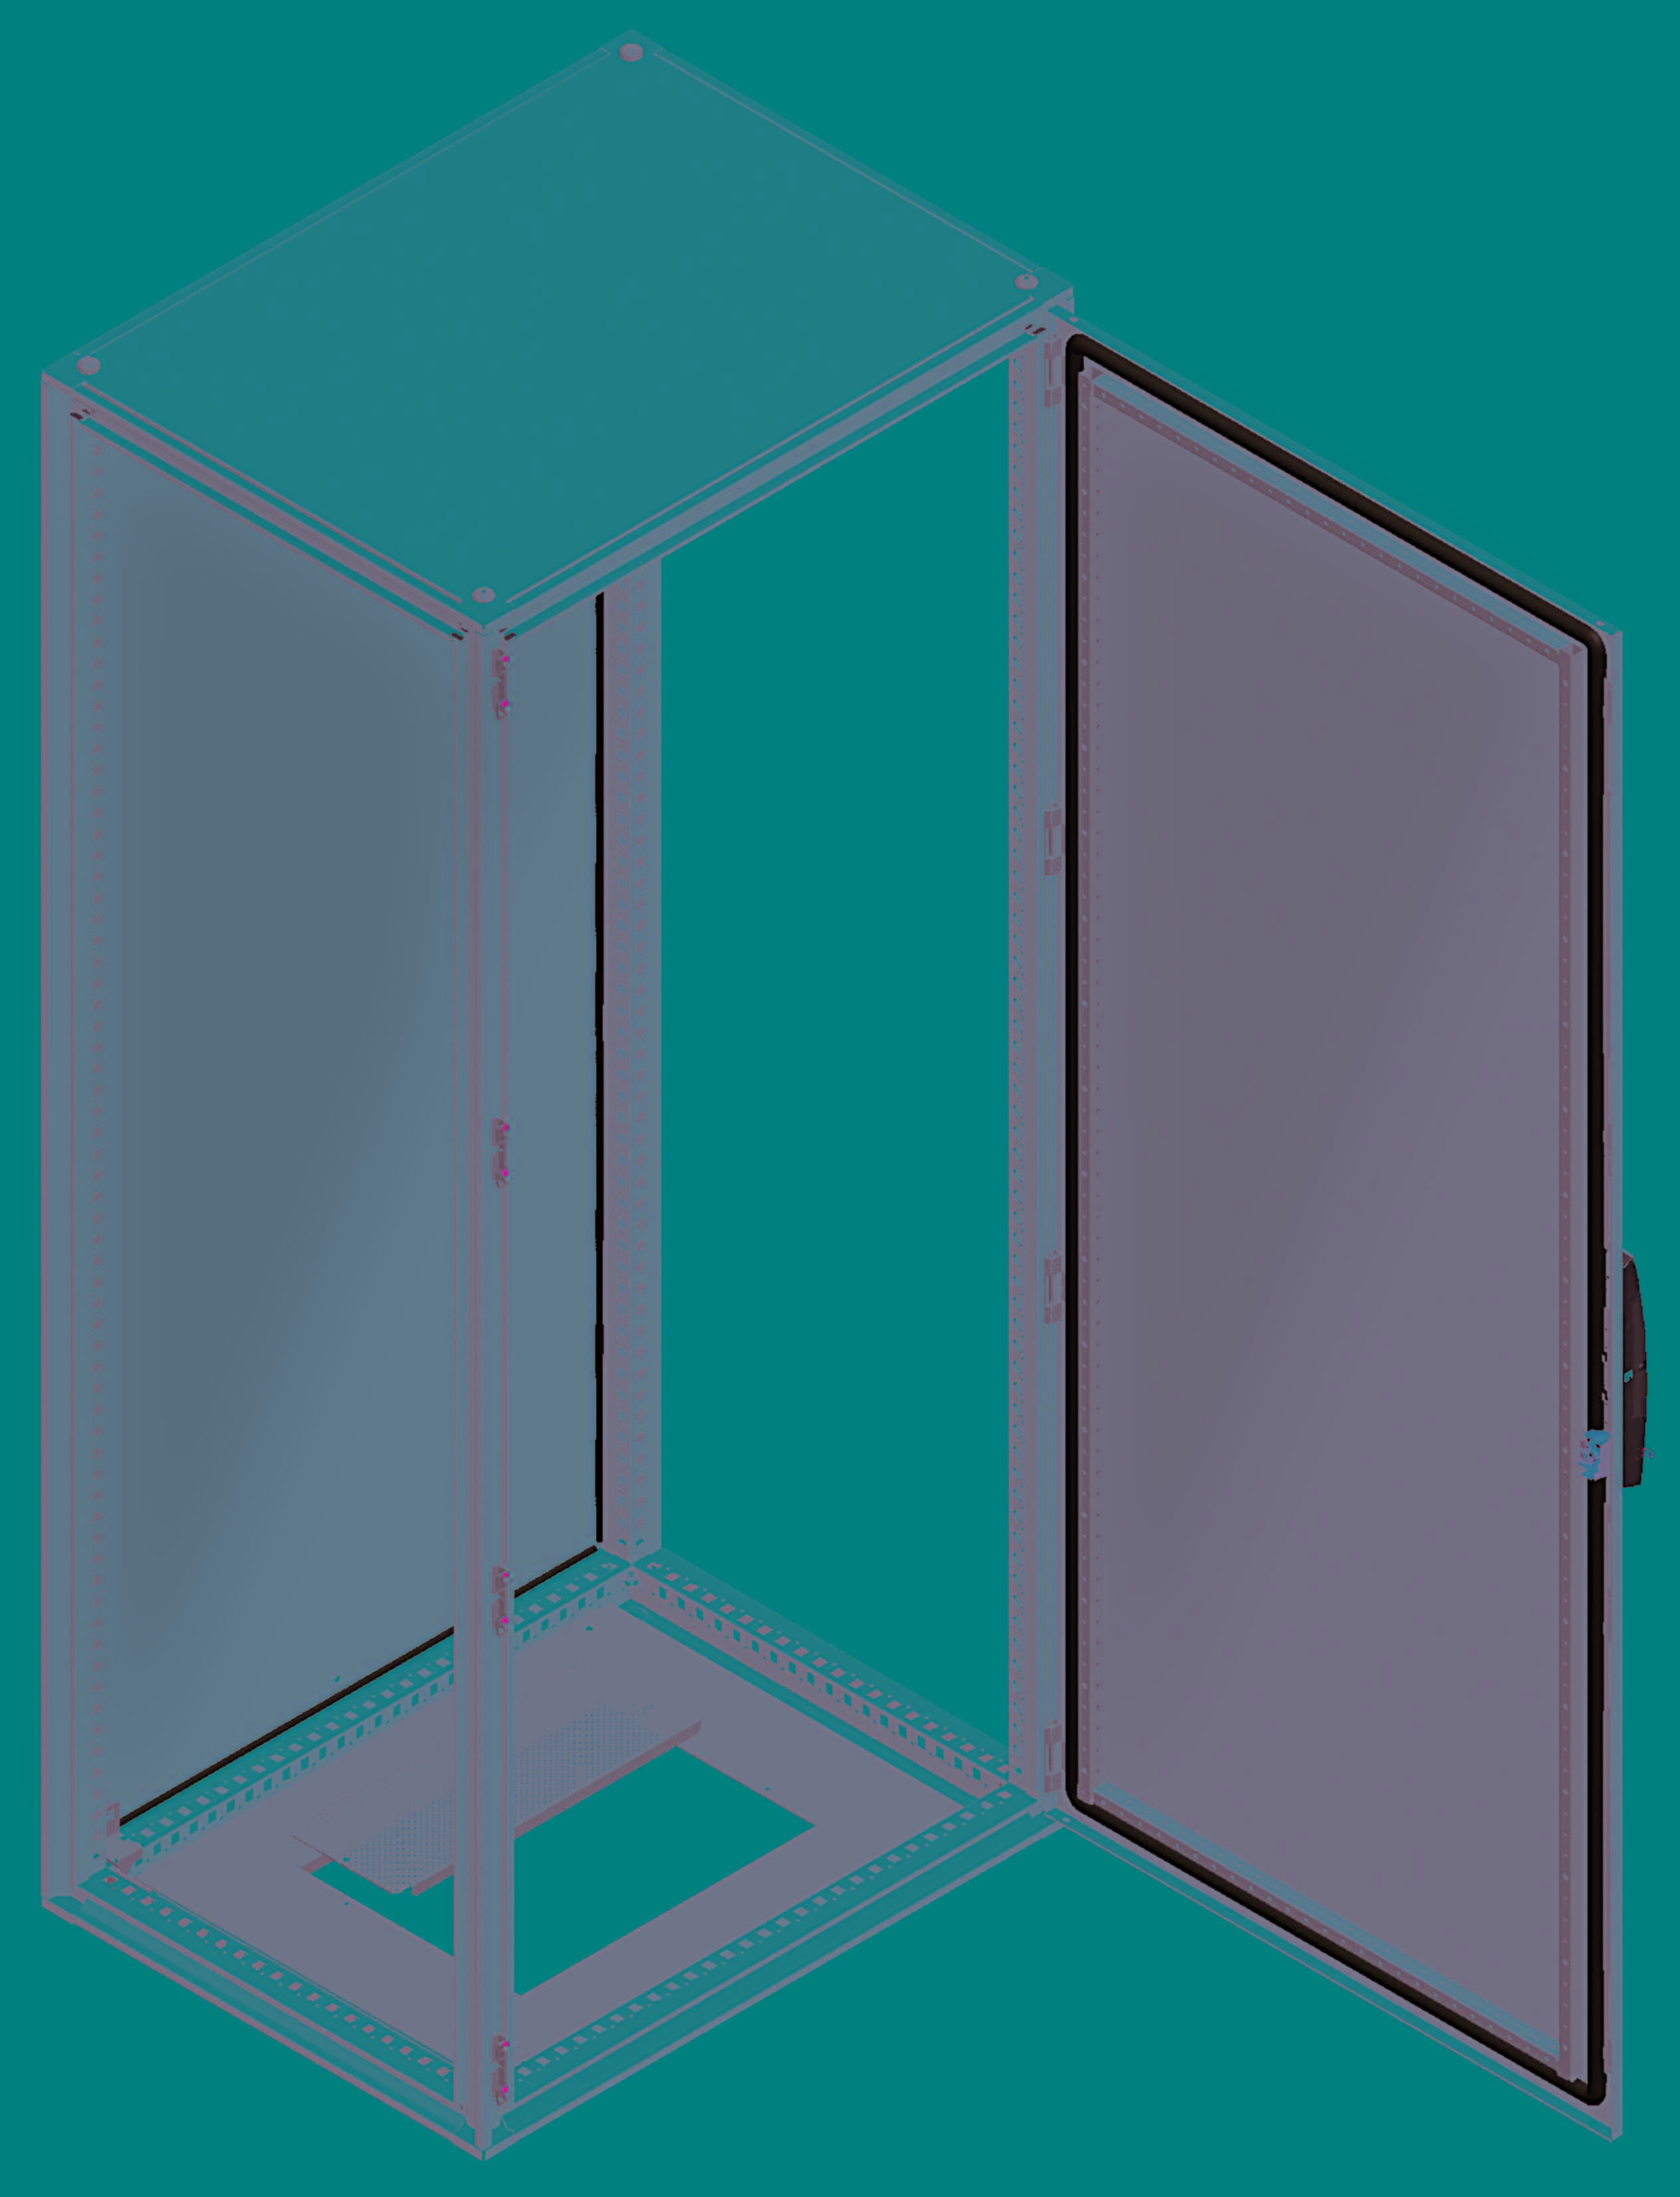 Image Description for https://tedi.itc-electronics.com/itcmedia/images/20190424/R/__5.jpeg